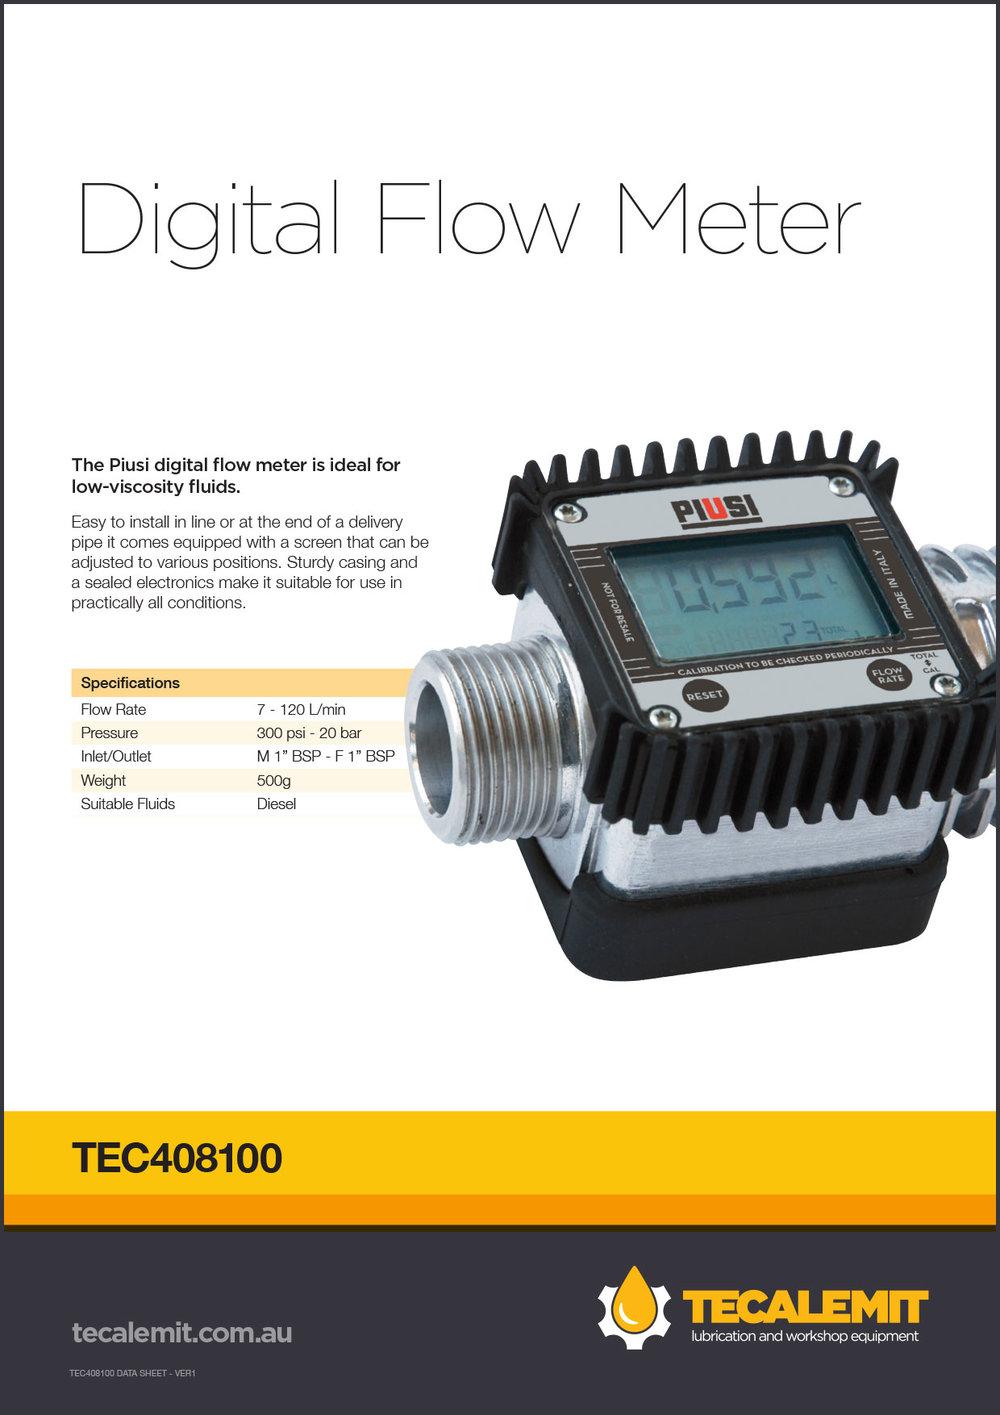 TEC408100 Product Info